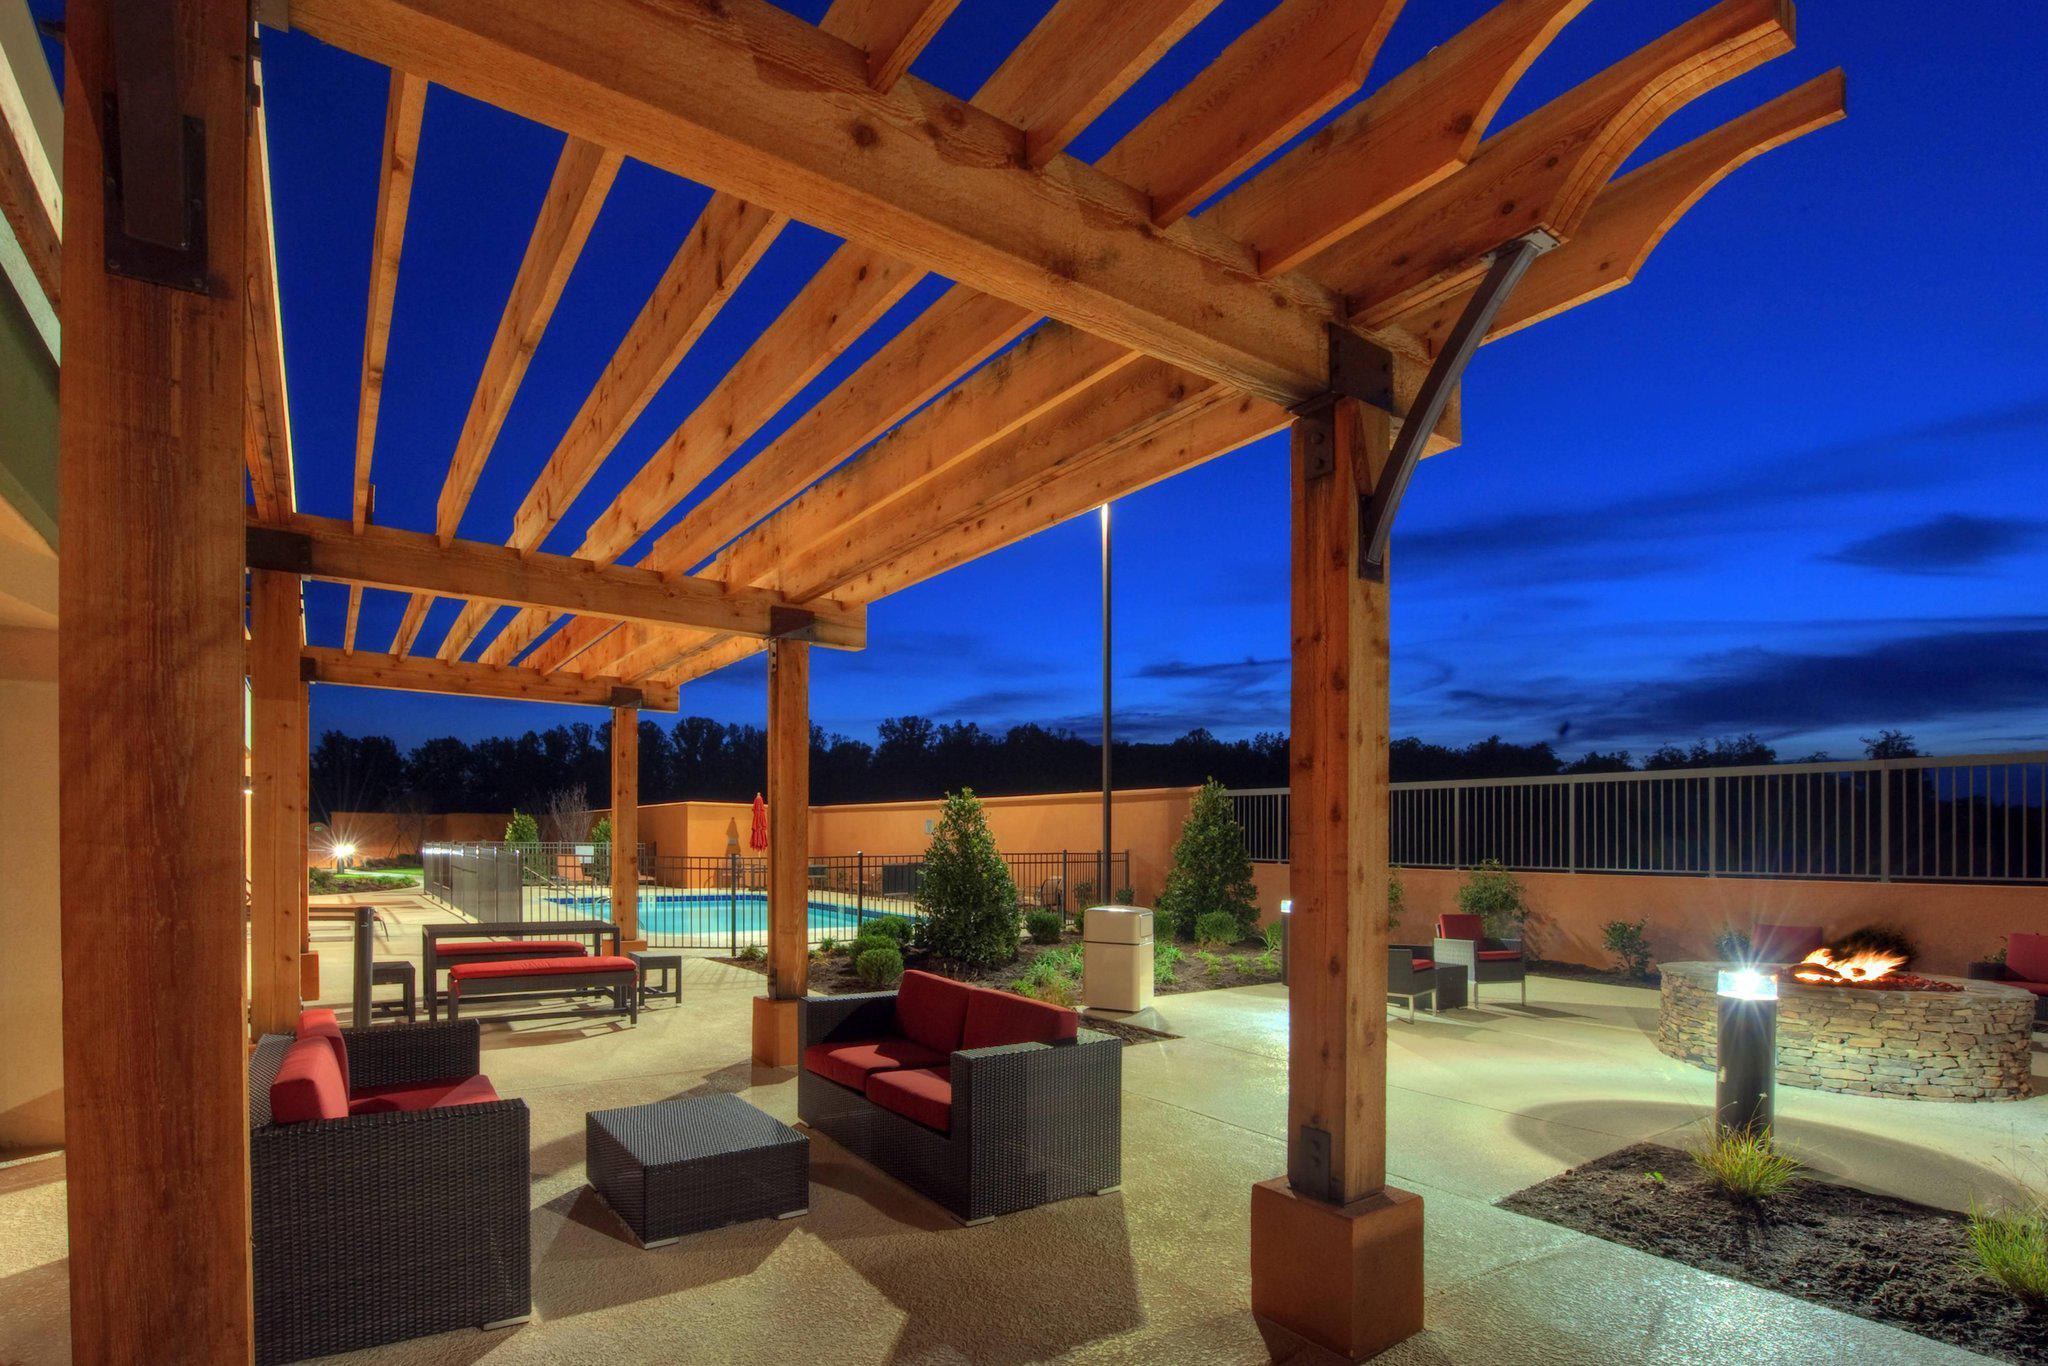 Courtyard by Marriott Johnson City